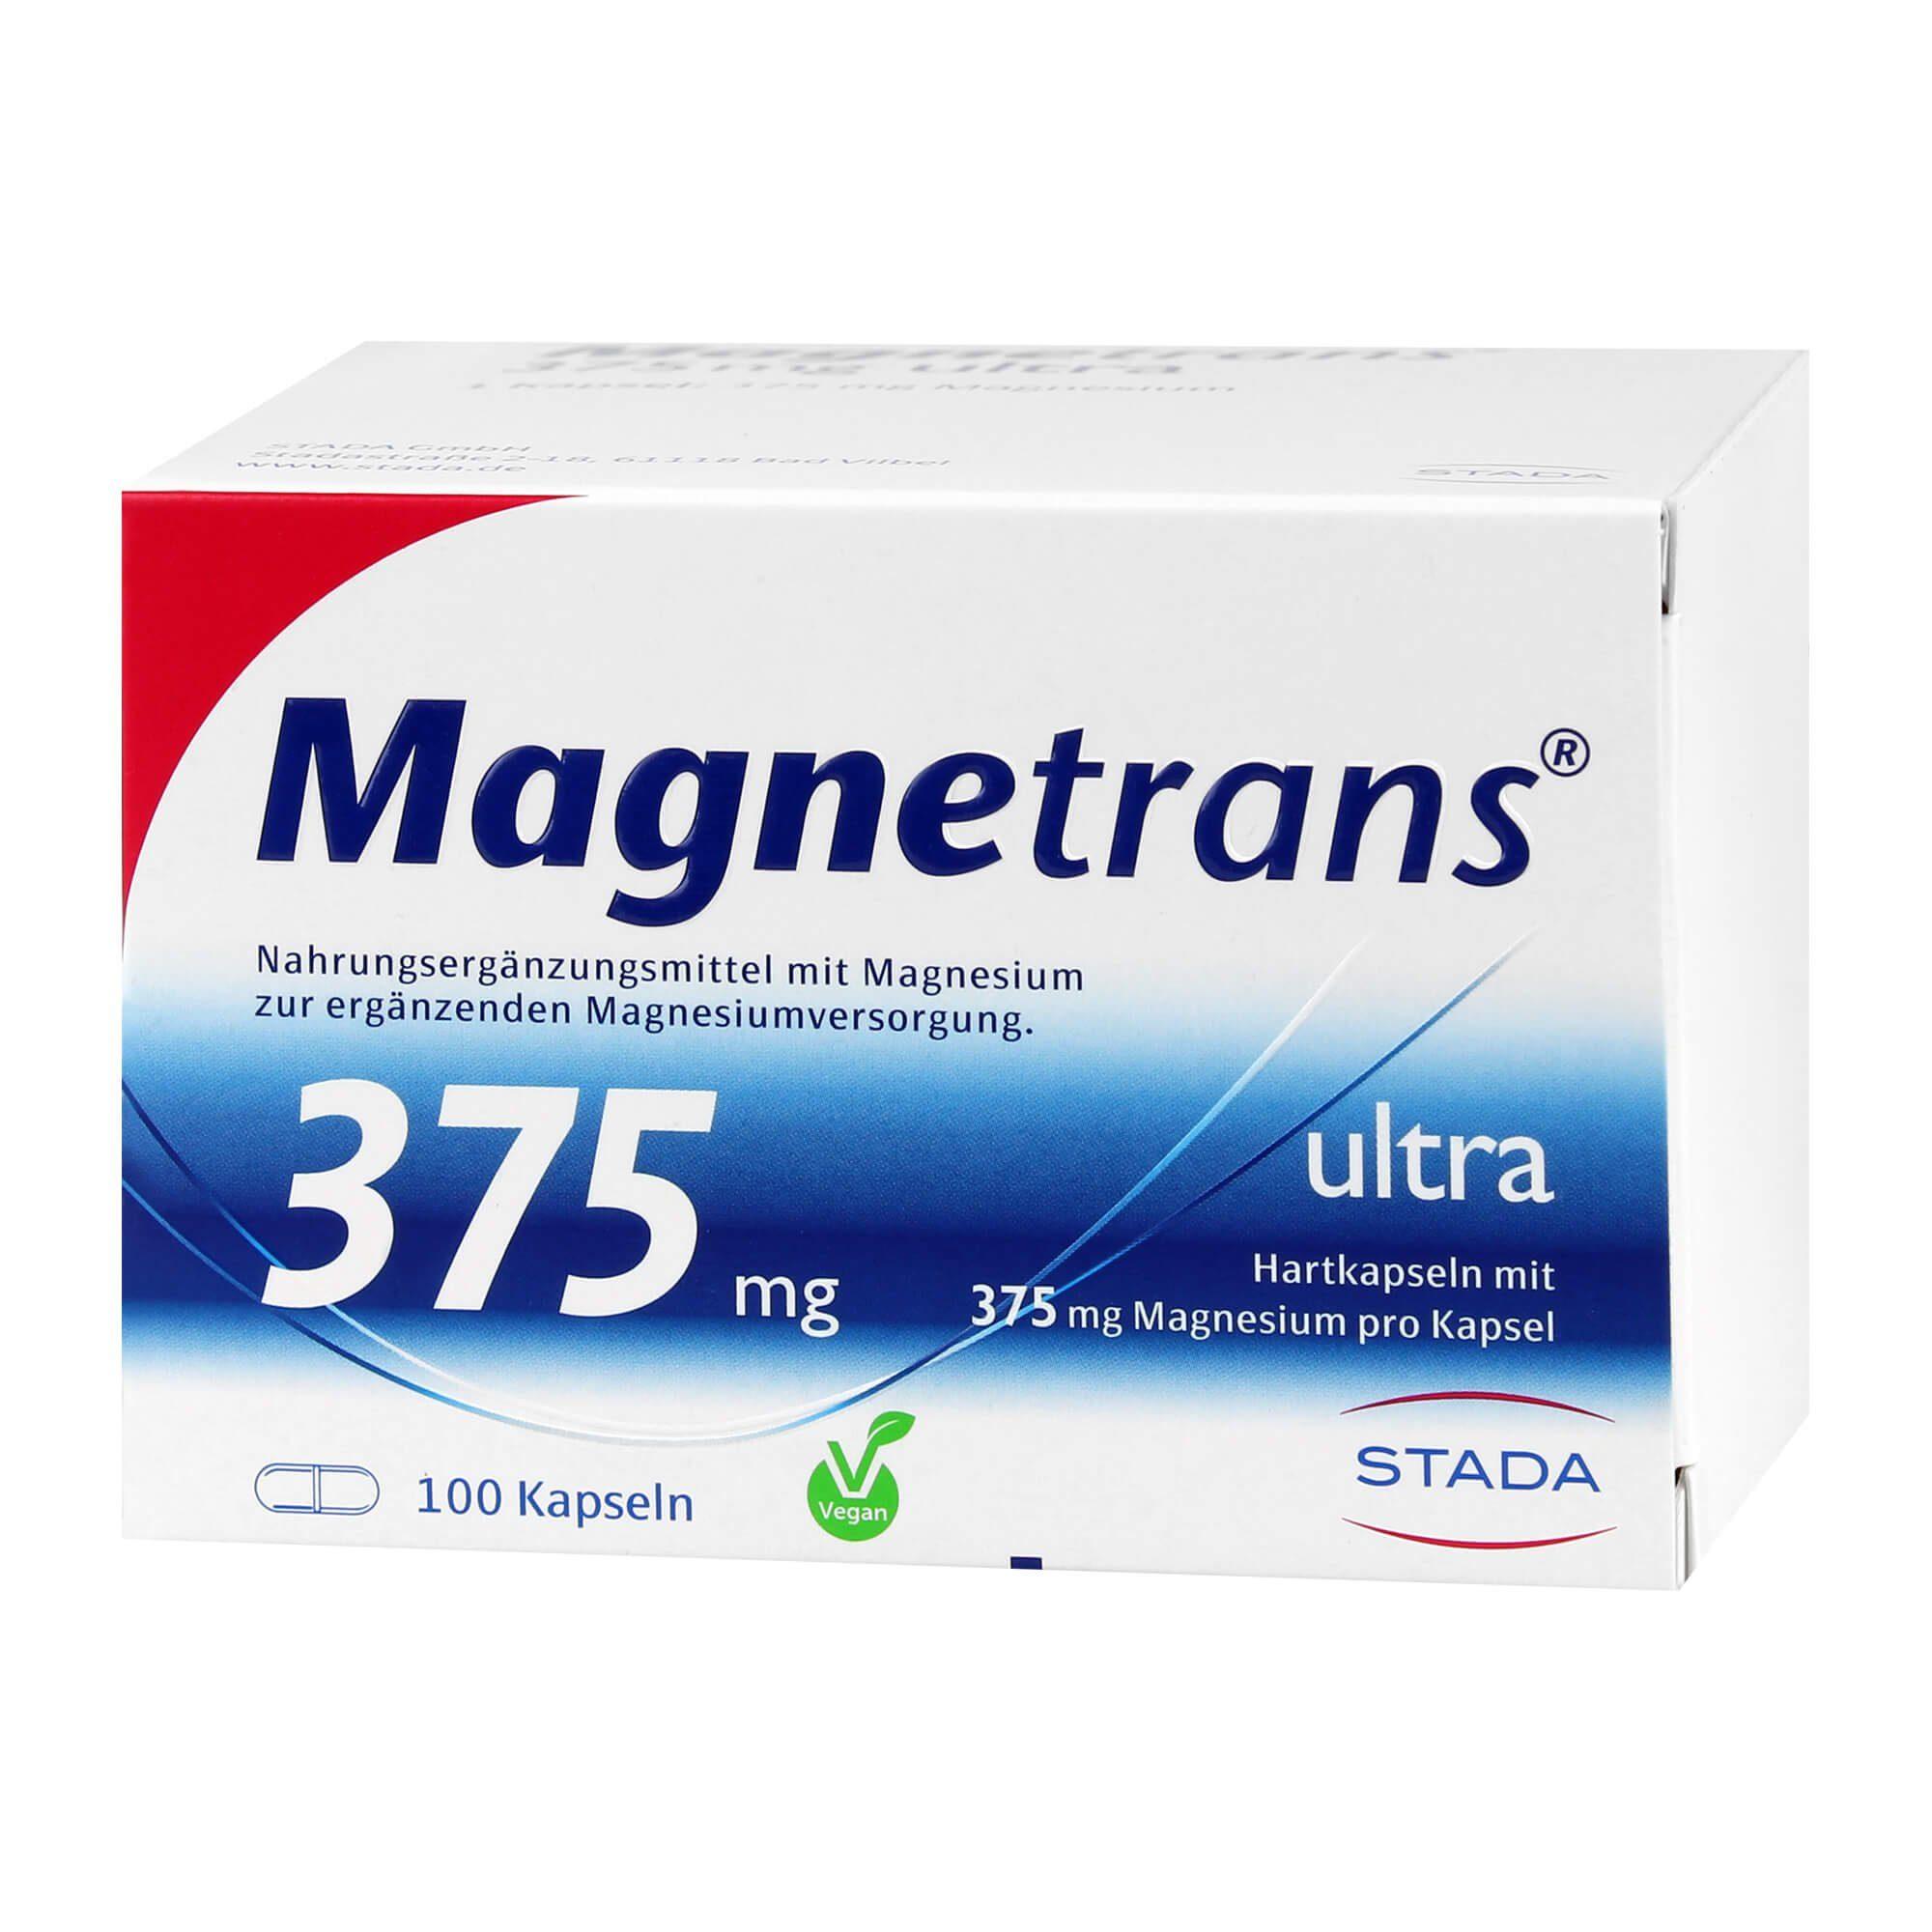 Magnetrans ultra Kapseln 375 mg, 100 St